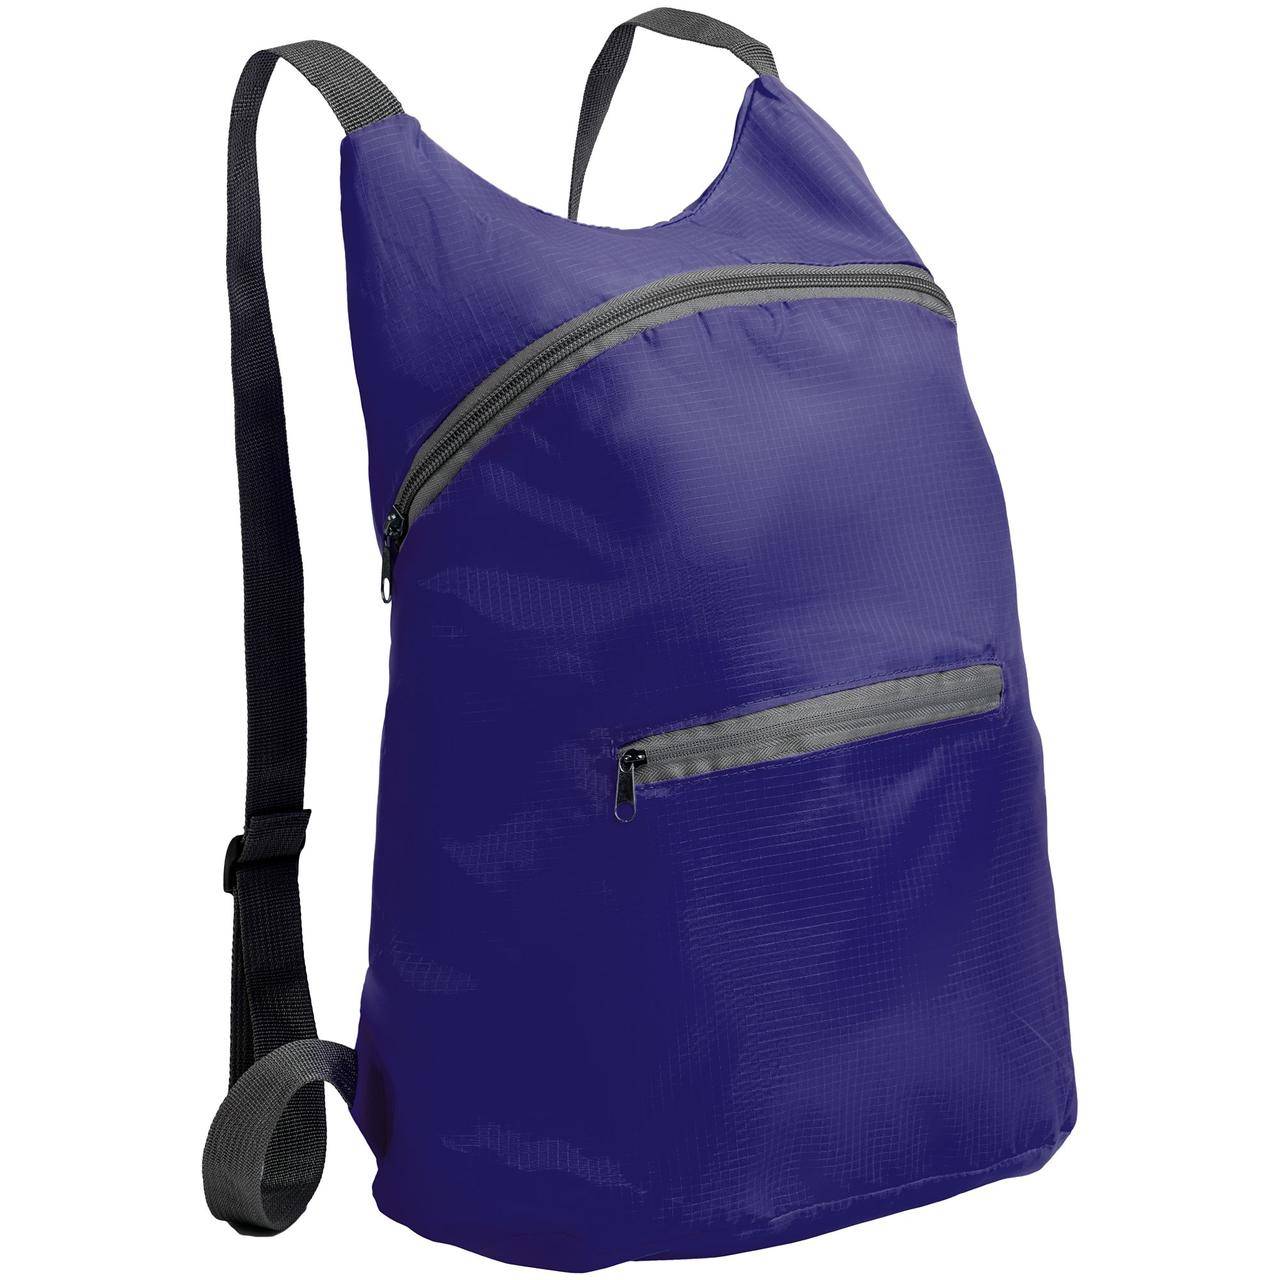 Складной рюкзак Barcelona, синий (артикул 12672.40)